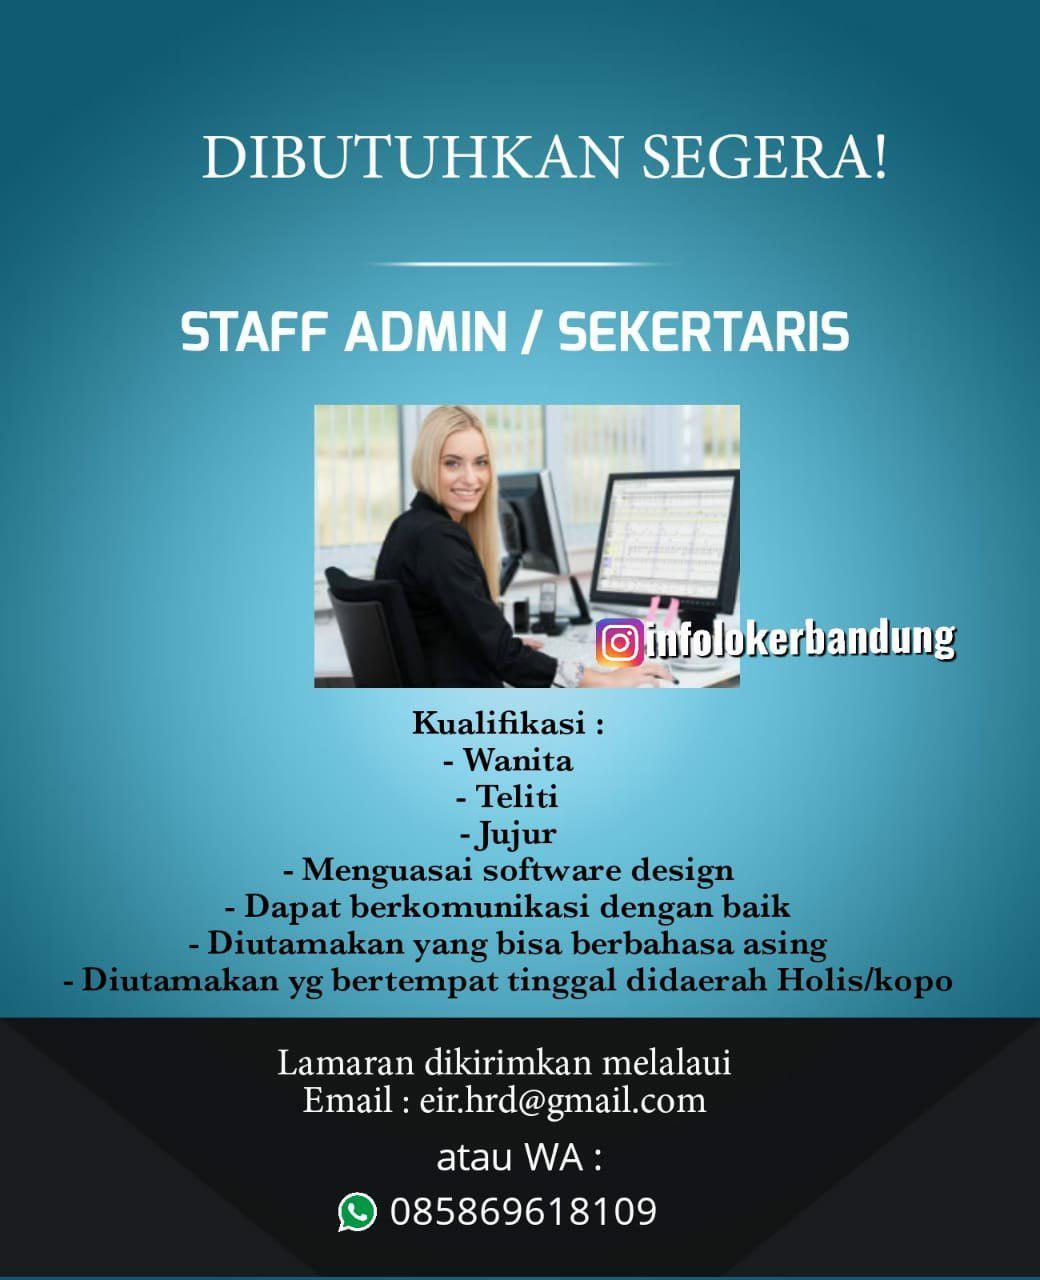 Lowongan Kerja Staff Admin / Sekertaris Bandung September 2019